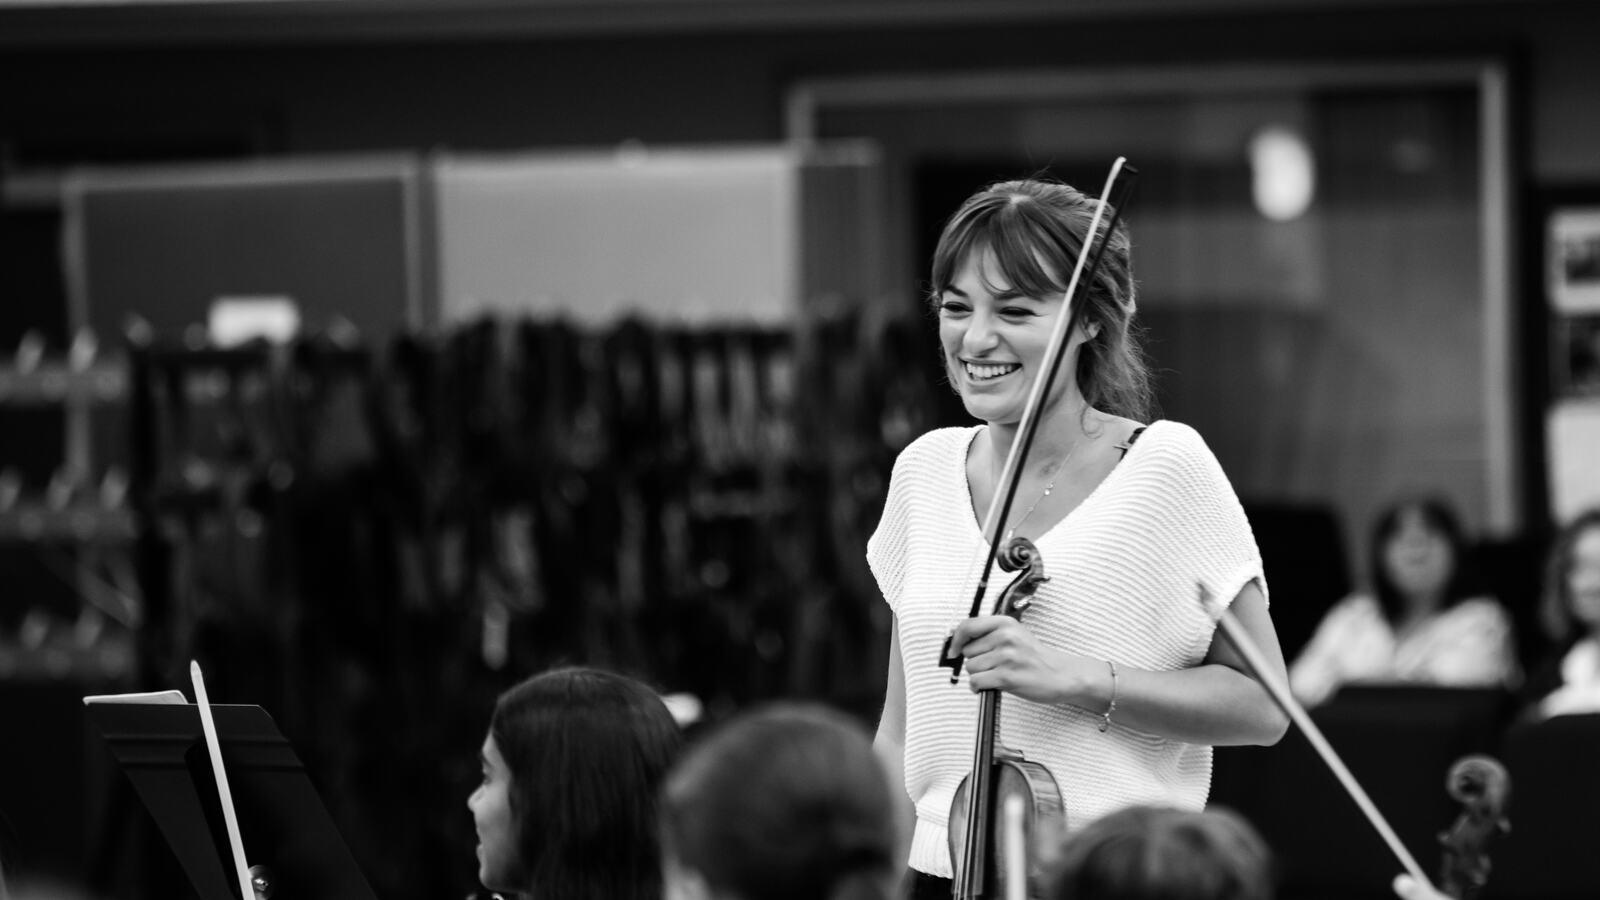 Nicola Benedetti, violinist and Southbank Centre Board Member